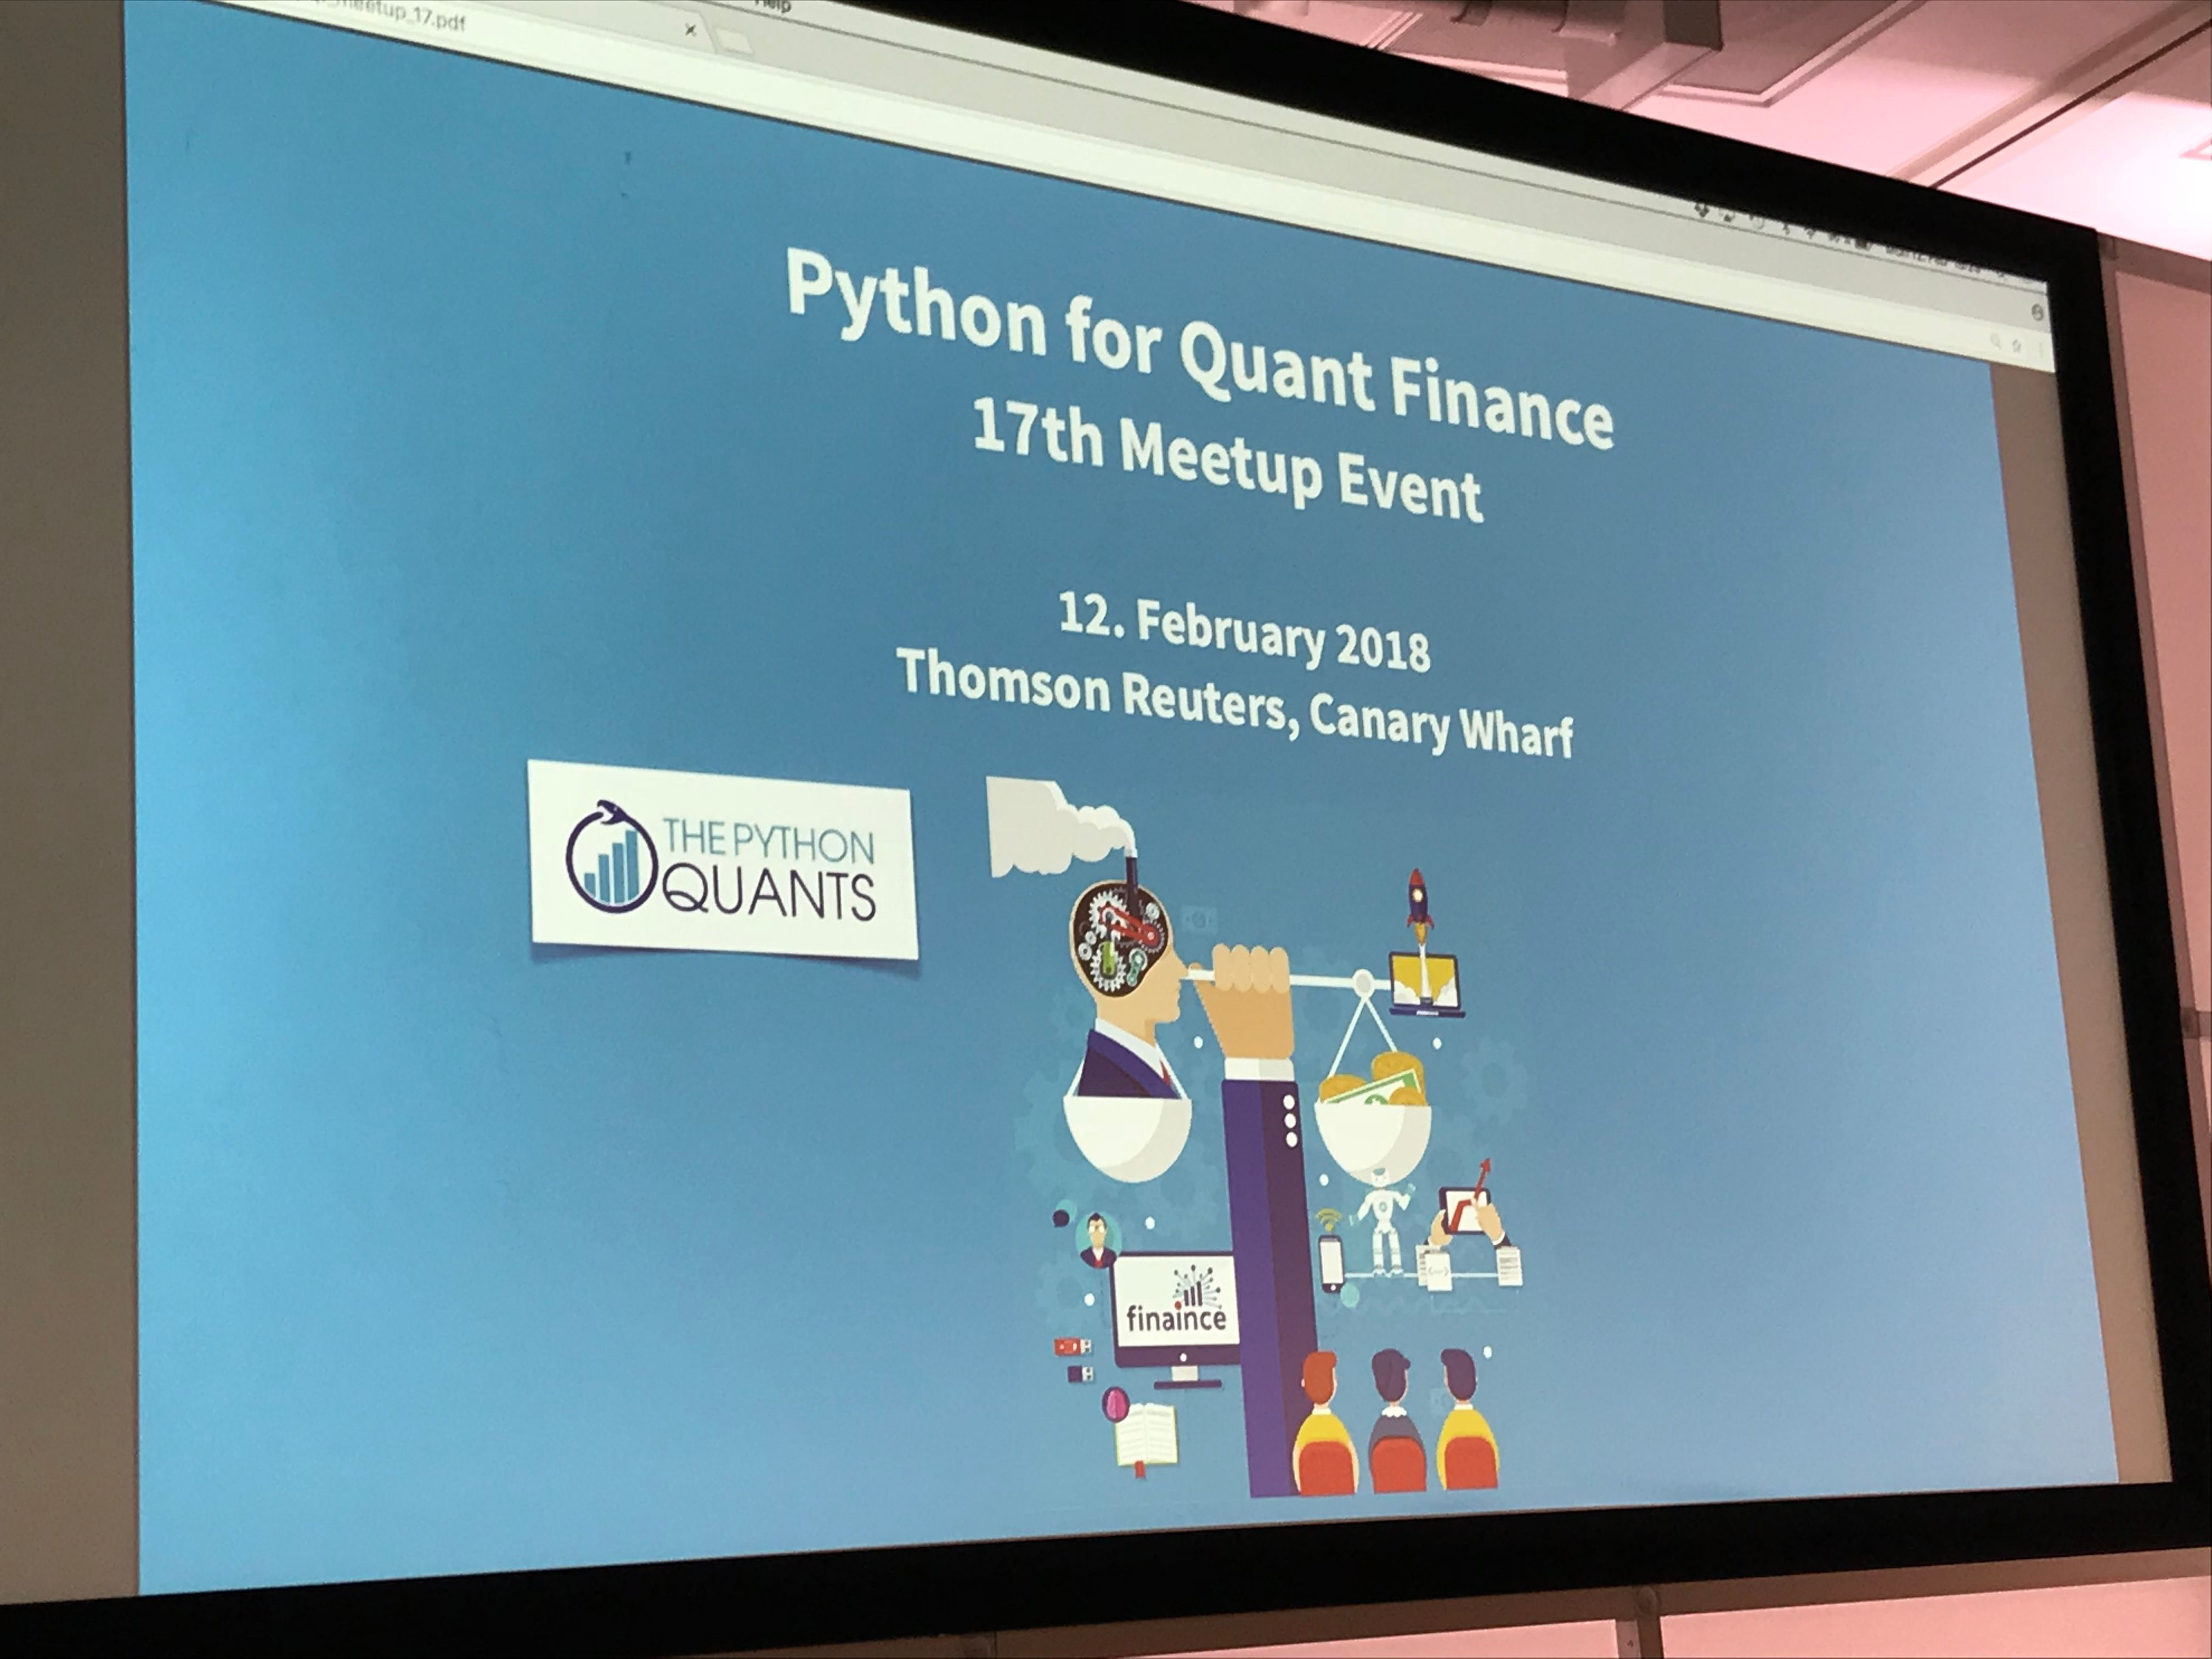 Python for Quant Finance